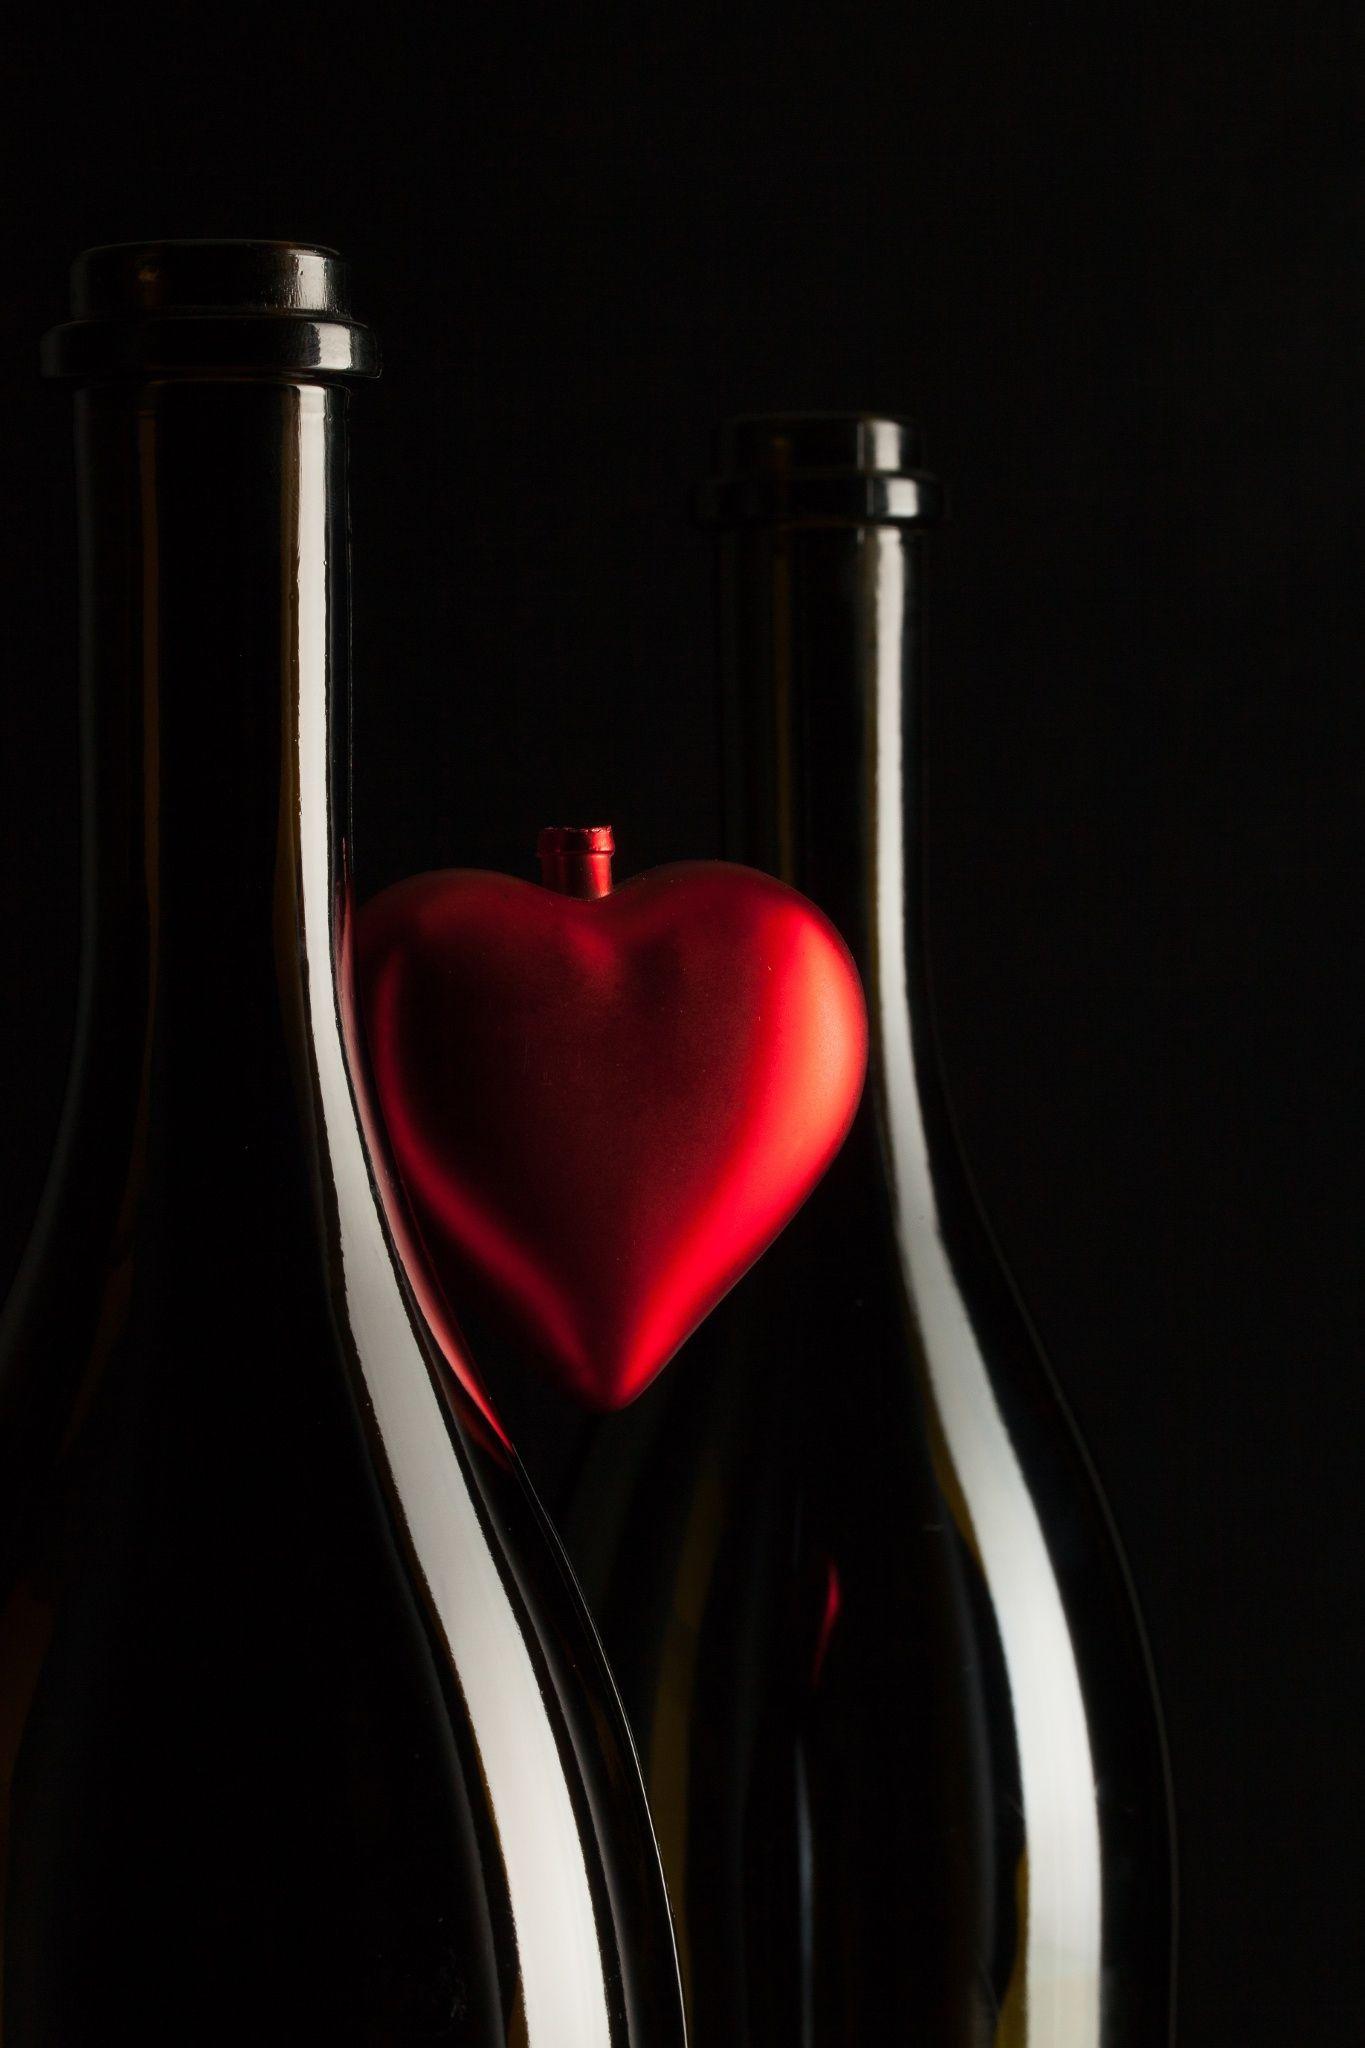 Two Bottles Elegant Wine Bottle Bottle Wine Bottle